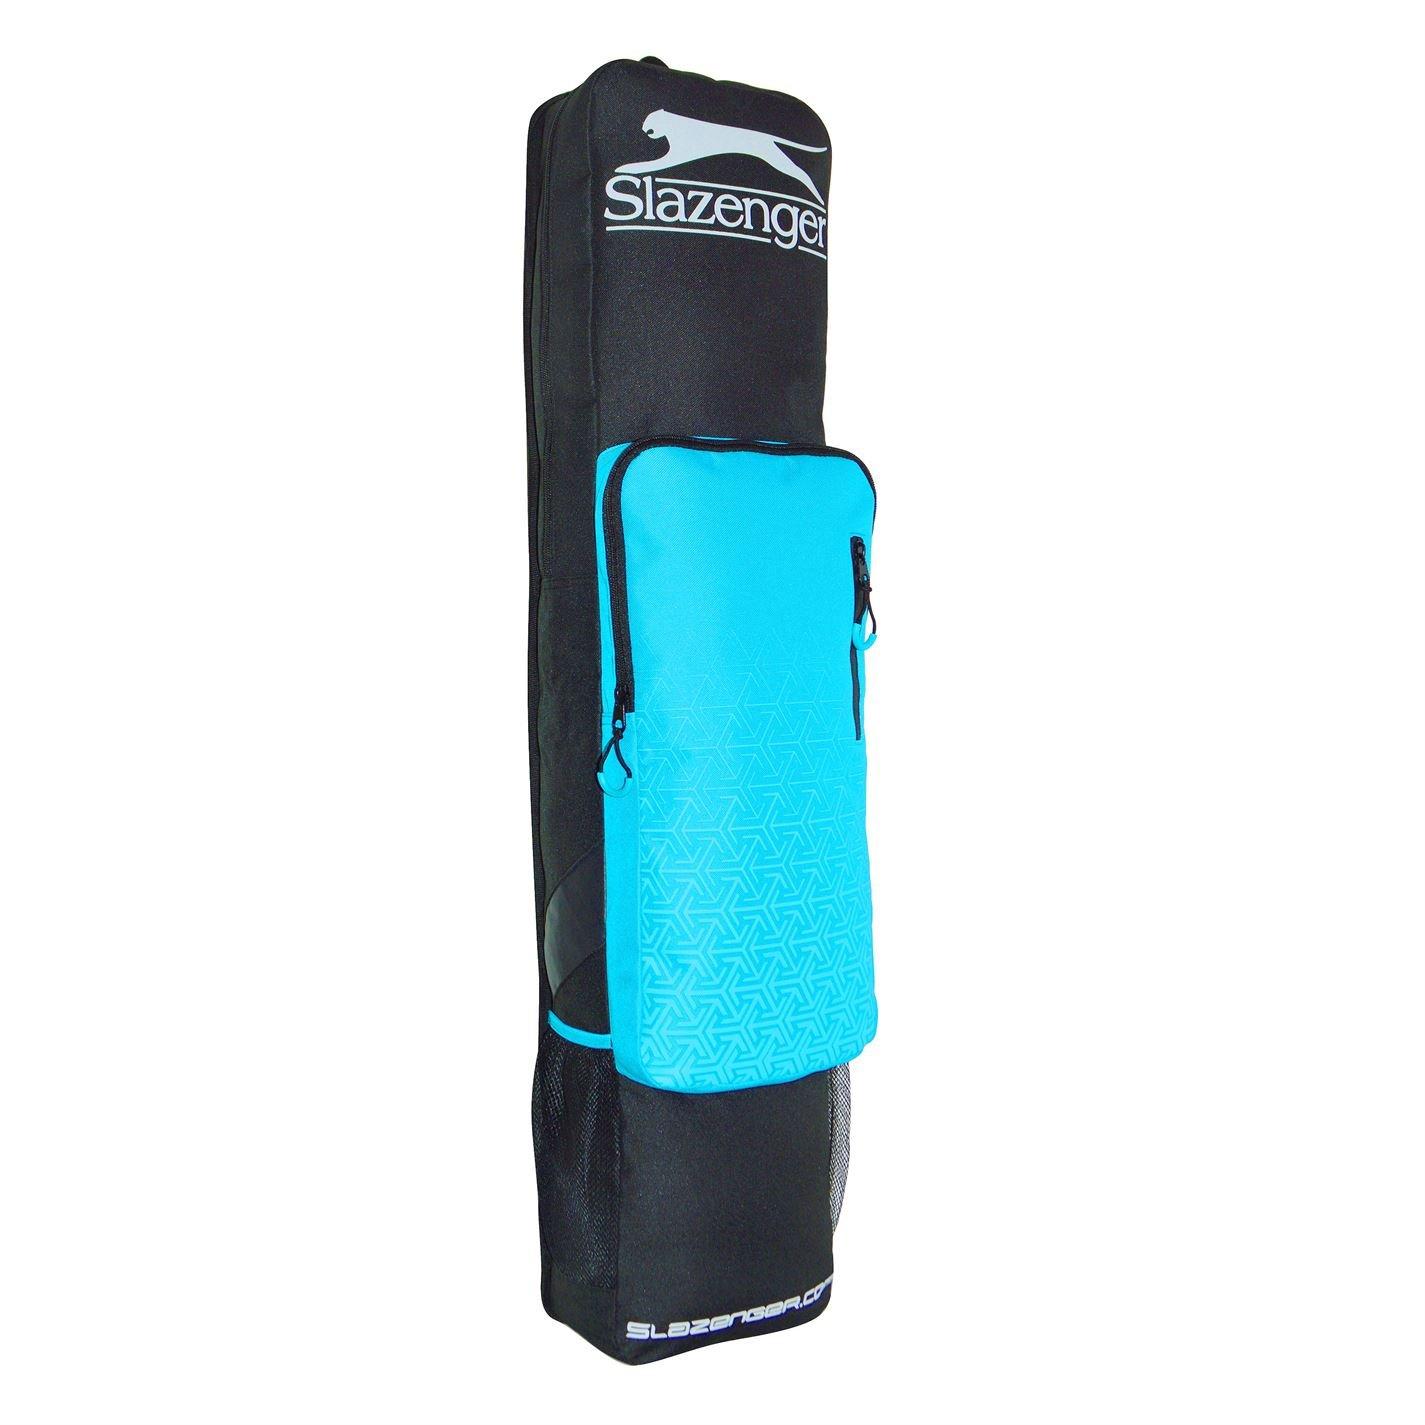 Slazenger Unisex Classic Hockey Stick Bag black/blue